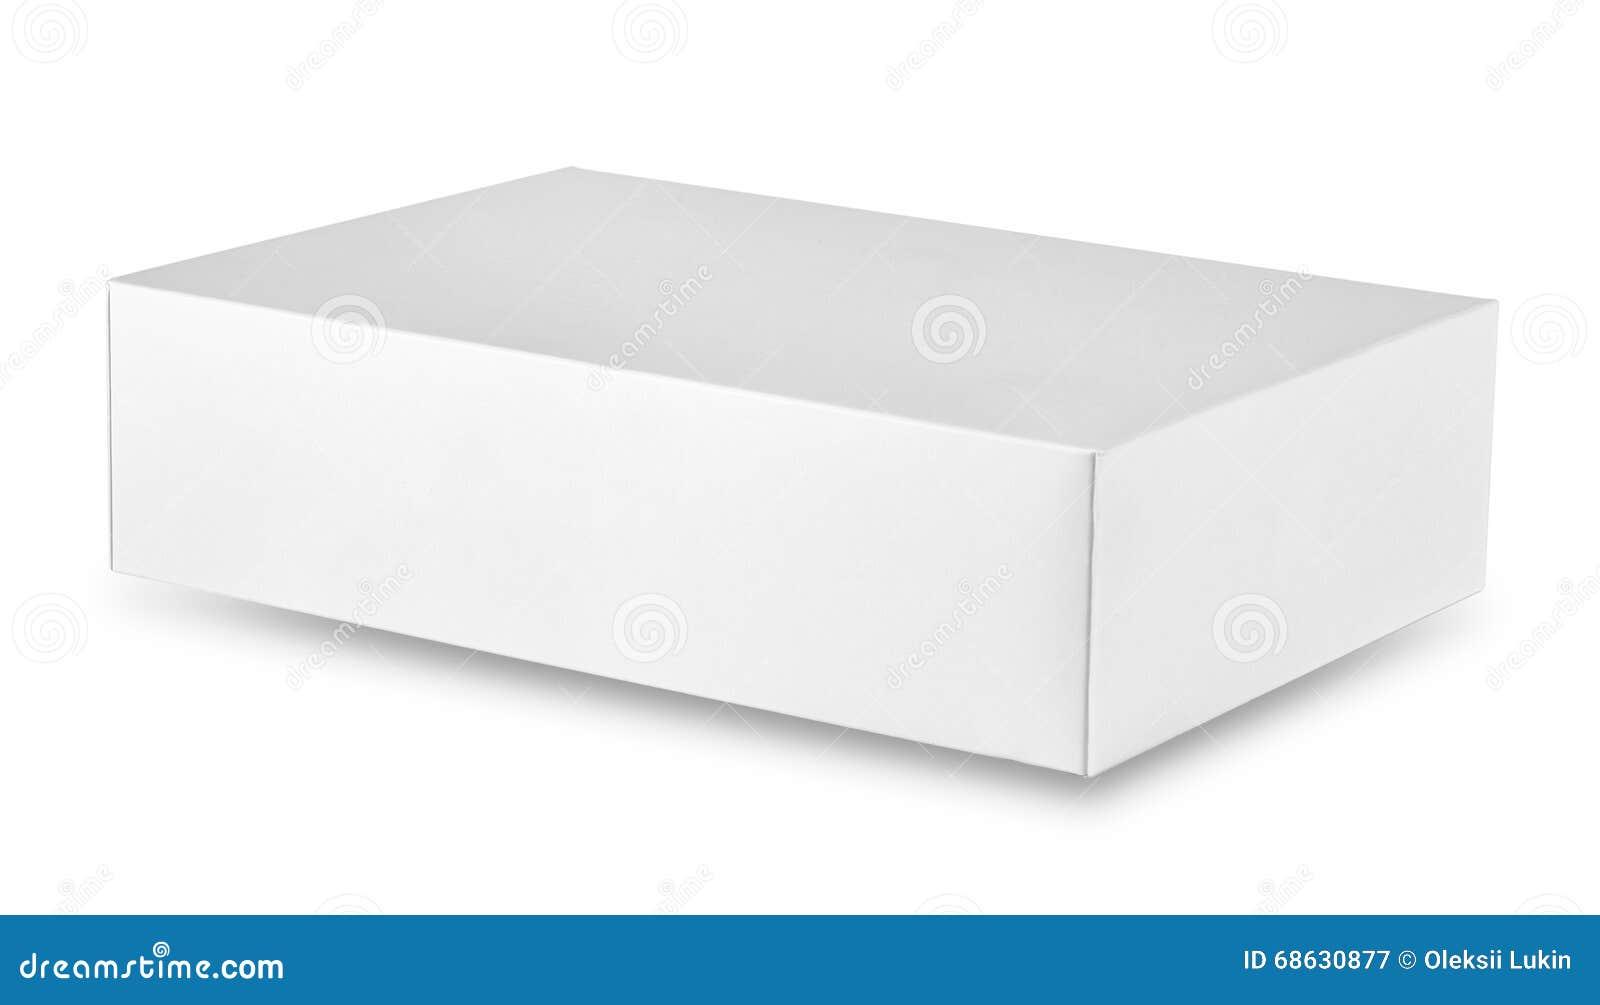 Closed White Rectangular Cardboard Box Stock Photo - Image: 68630877